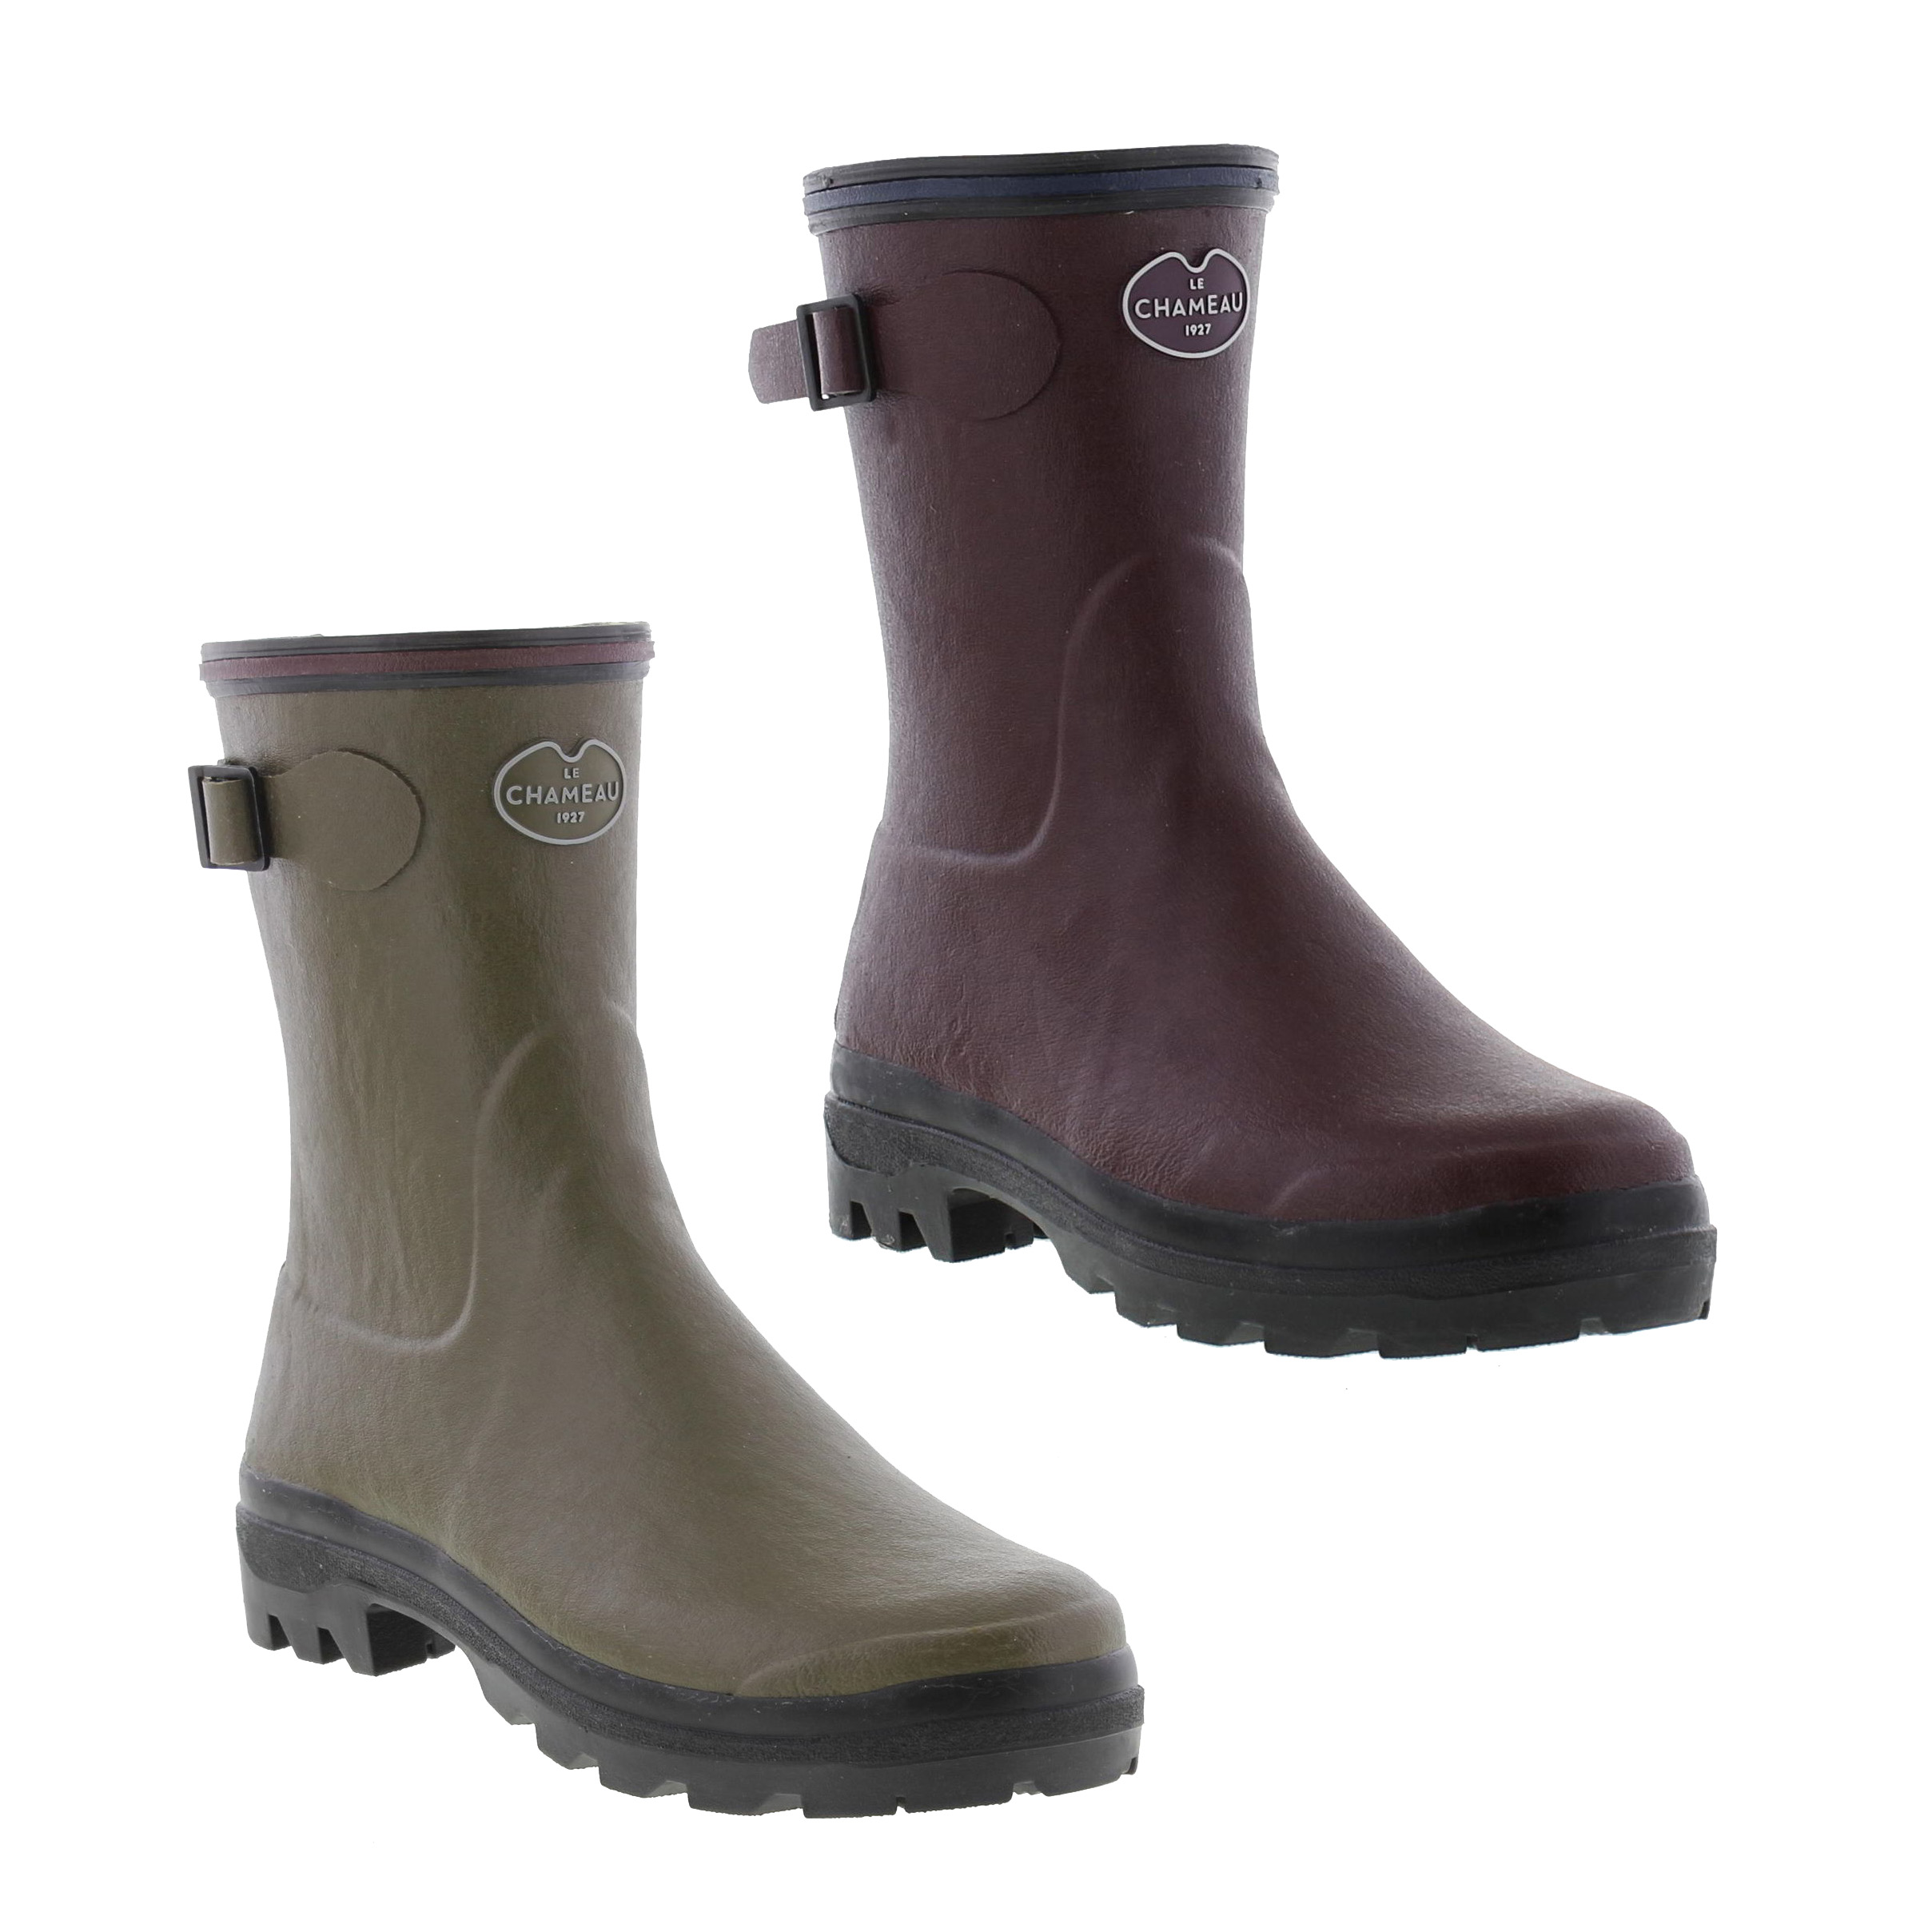 Le Chameau Giverny Low Womens Short Wellies Wellington Boots Size 4 ... 2dd5b4a037e